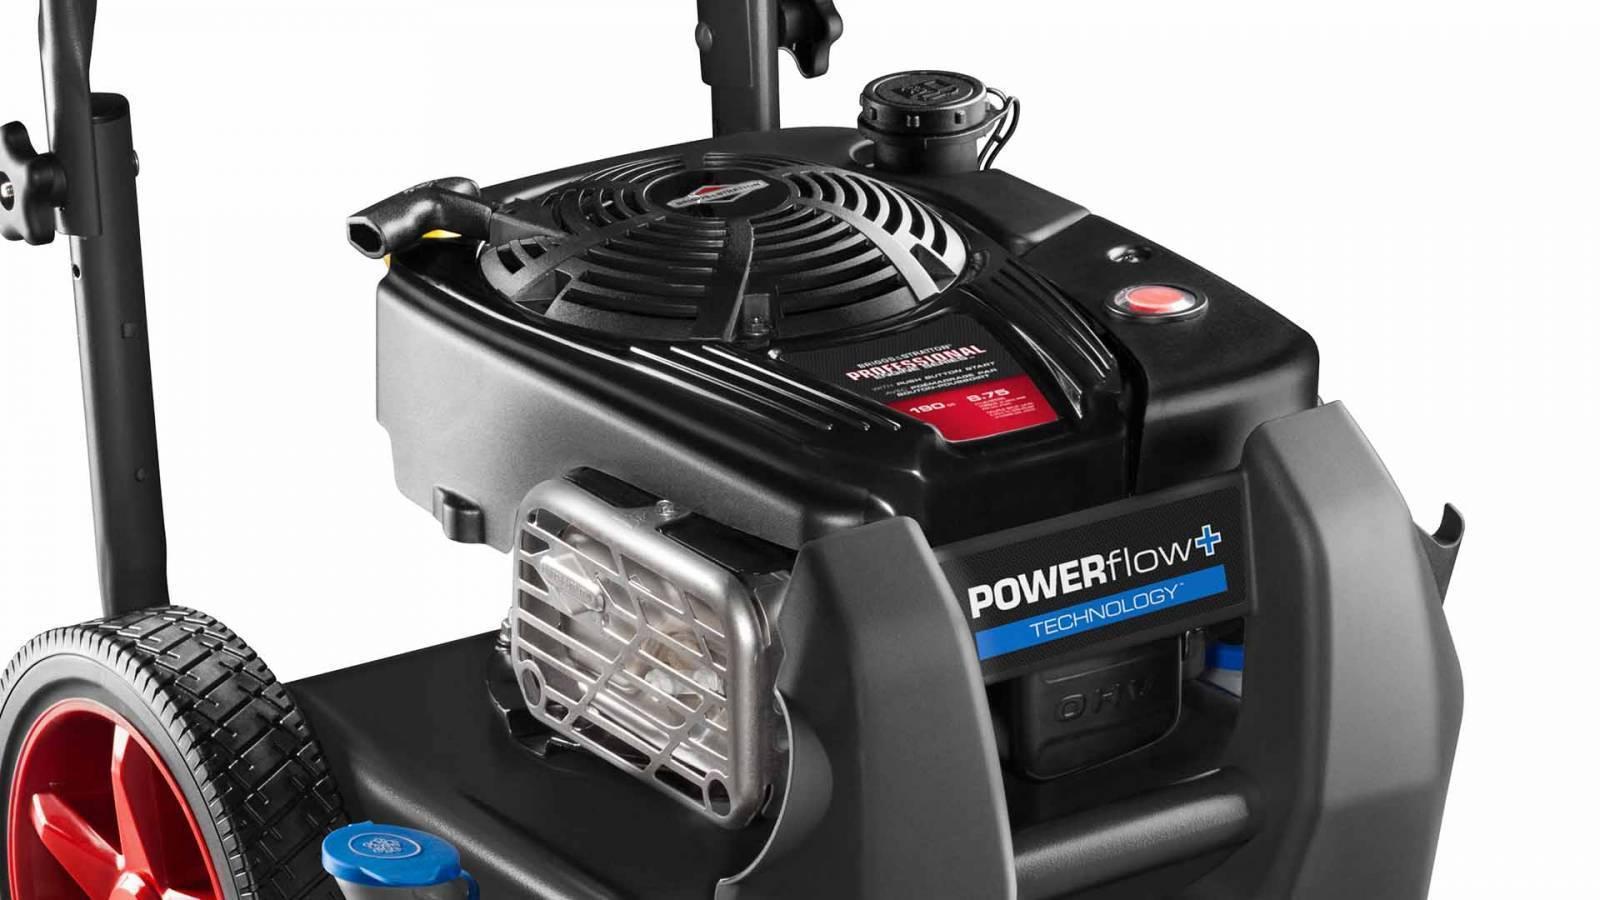 Lavadora alta Pressão Briggs & Stratton Powerflow+, OFERTA! - BSS Maquinas